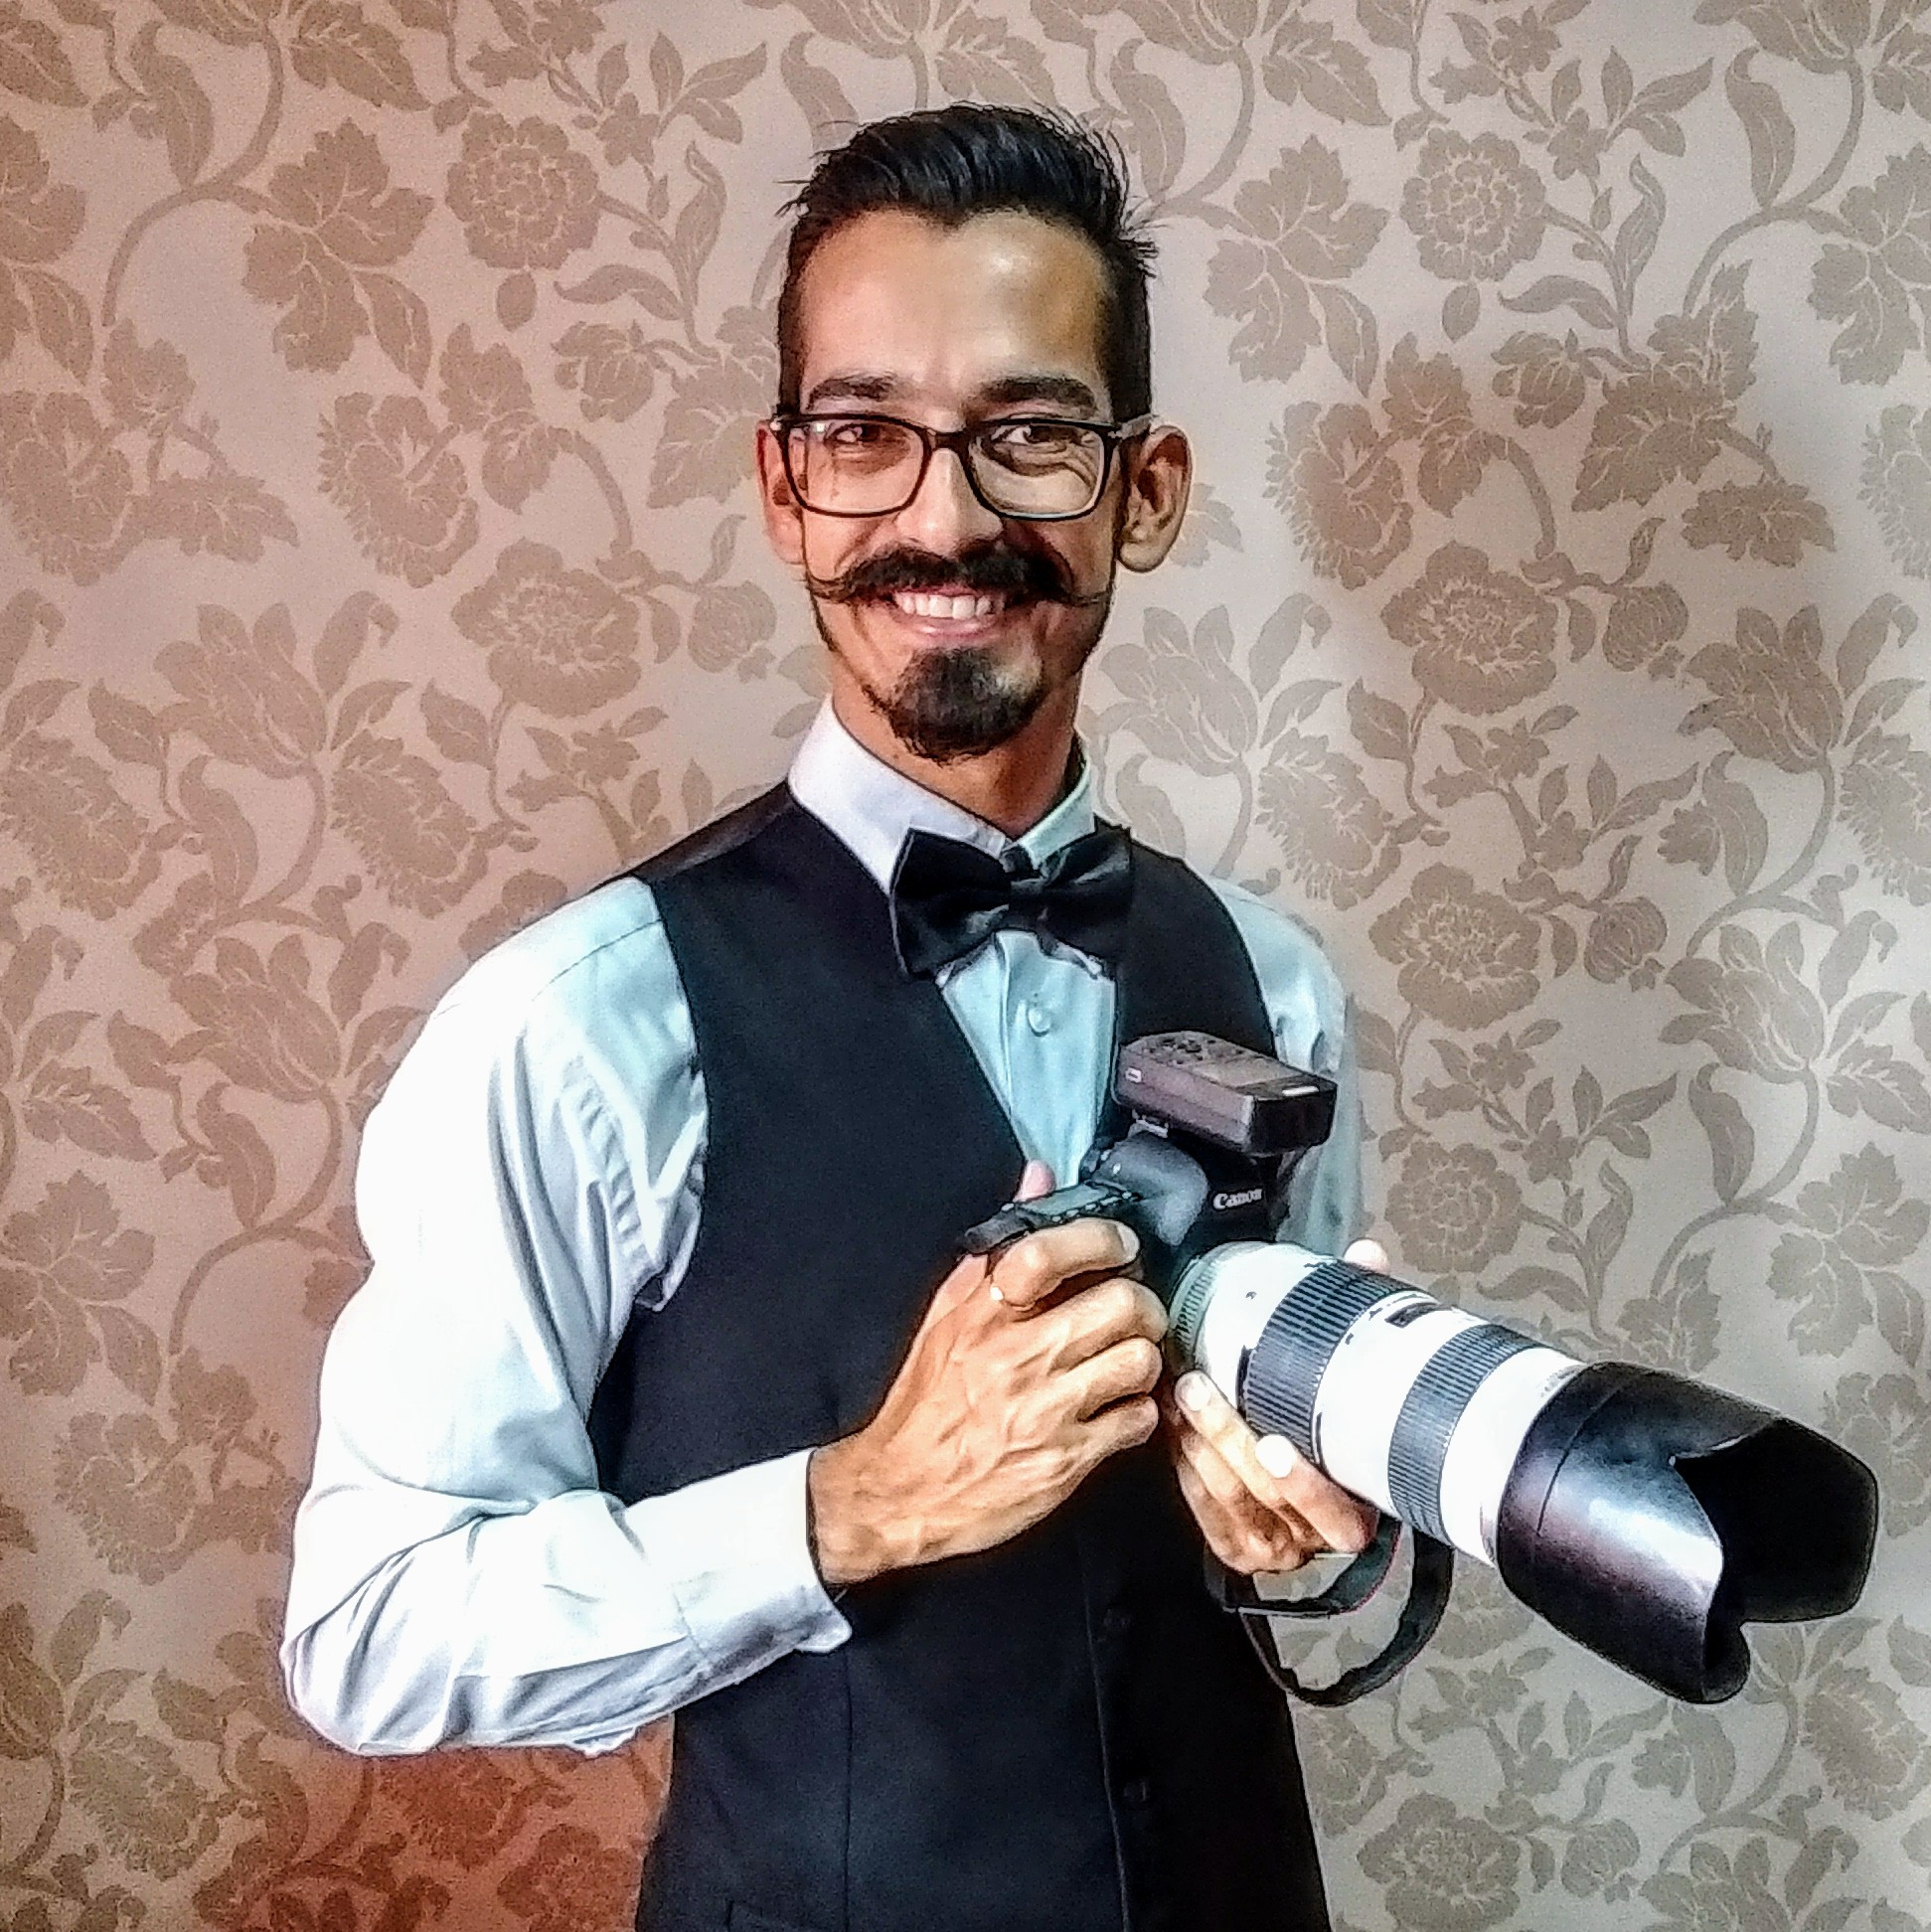 Sobre Alison Luiz - Fotografo de Casamentos em Itaquaquecetuba